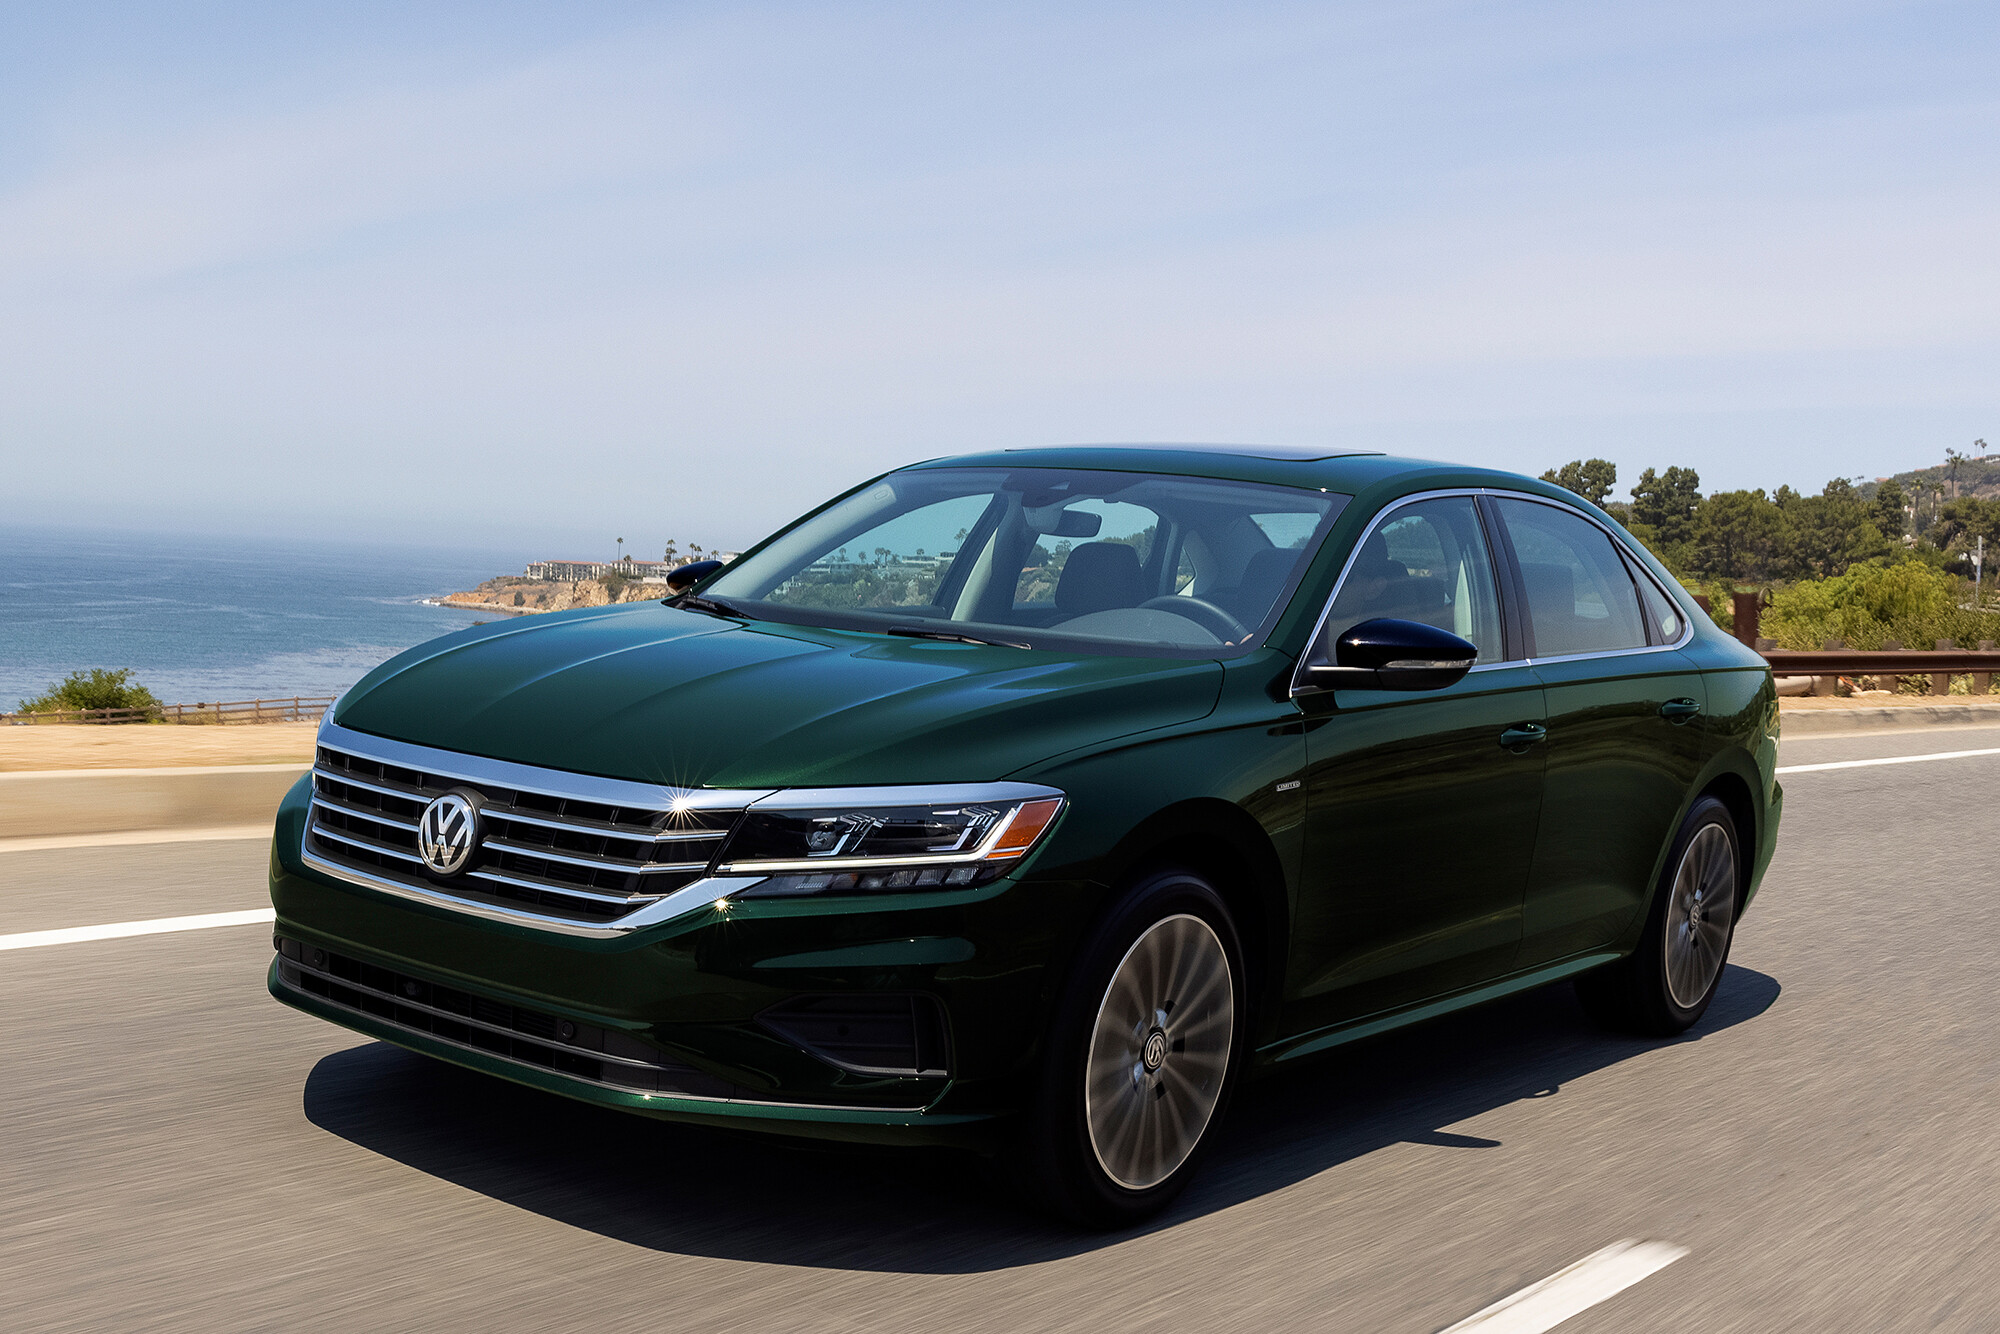 Foto de Volkswagen Passat Limited Edtion (8/10)